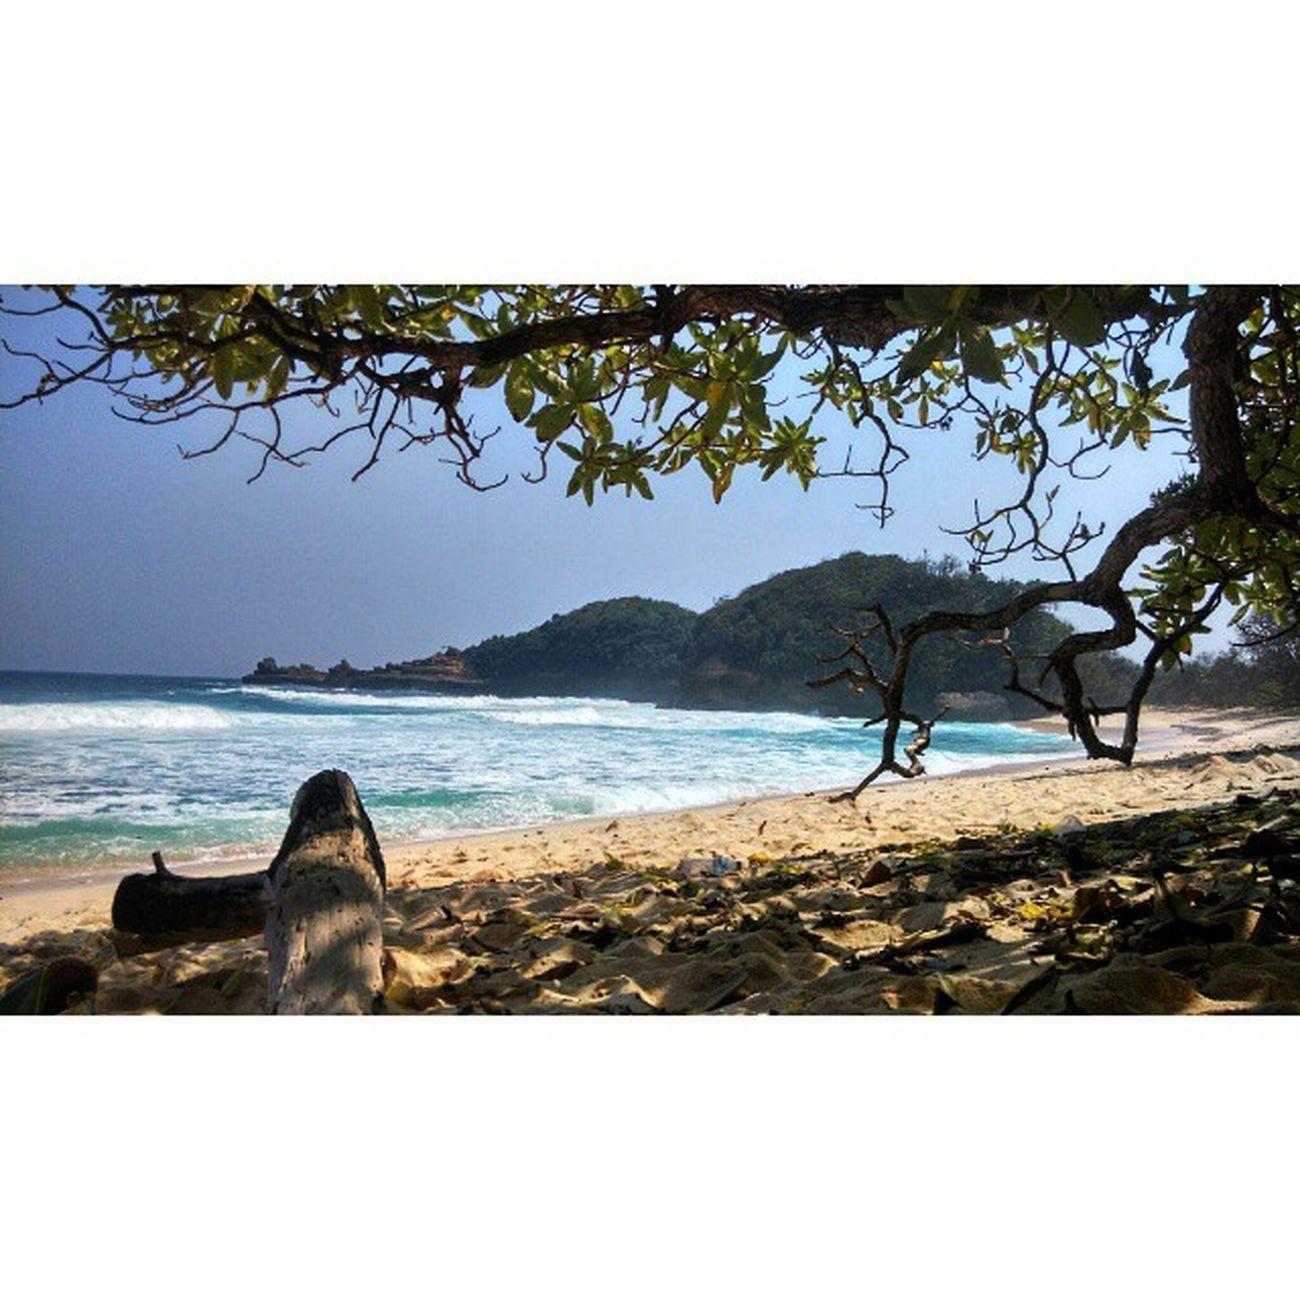 Laoooot//Laoooot Pulaupenyu Naptime Mangrove Cigarrete Smokethesea Freshlyair Bringmeback Tosca Blue Green Cream Colours Sky